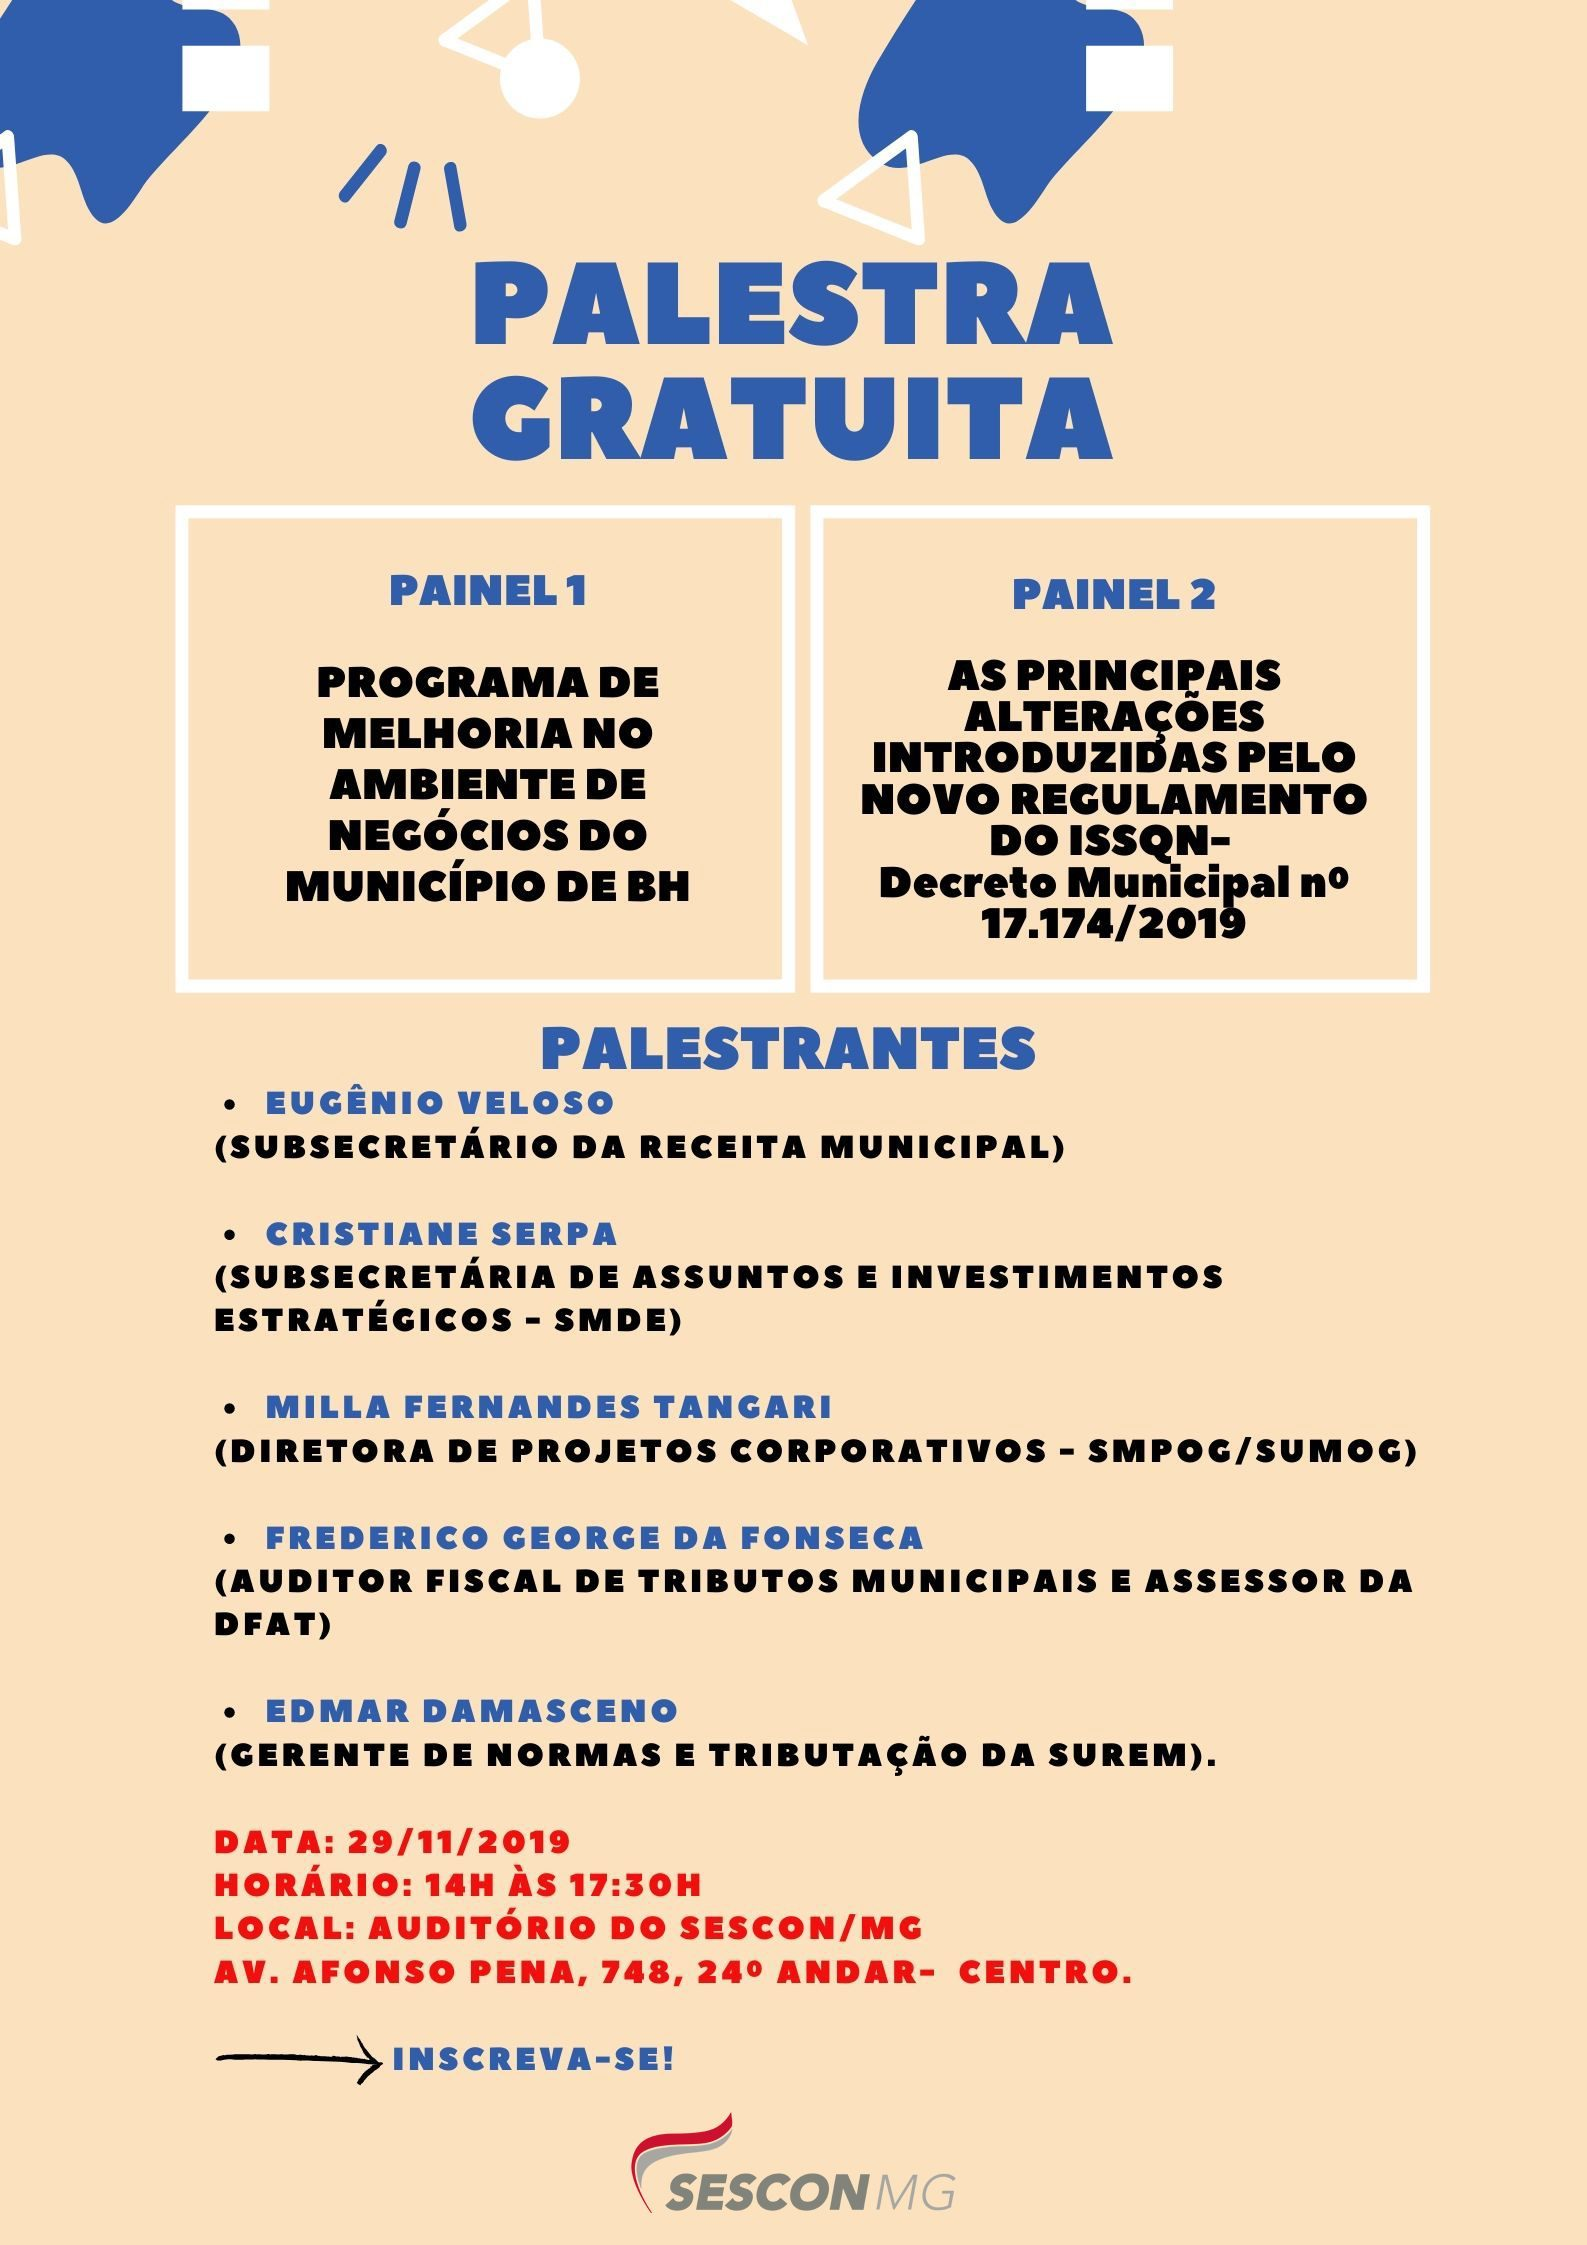 SECRETARIA MUNICIPAL DA FAZENDA REALIZA PALESTRAS GRATUITAS NO SESCONMG